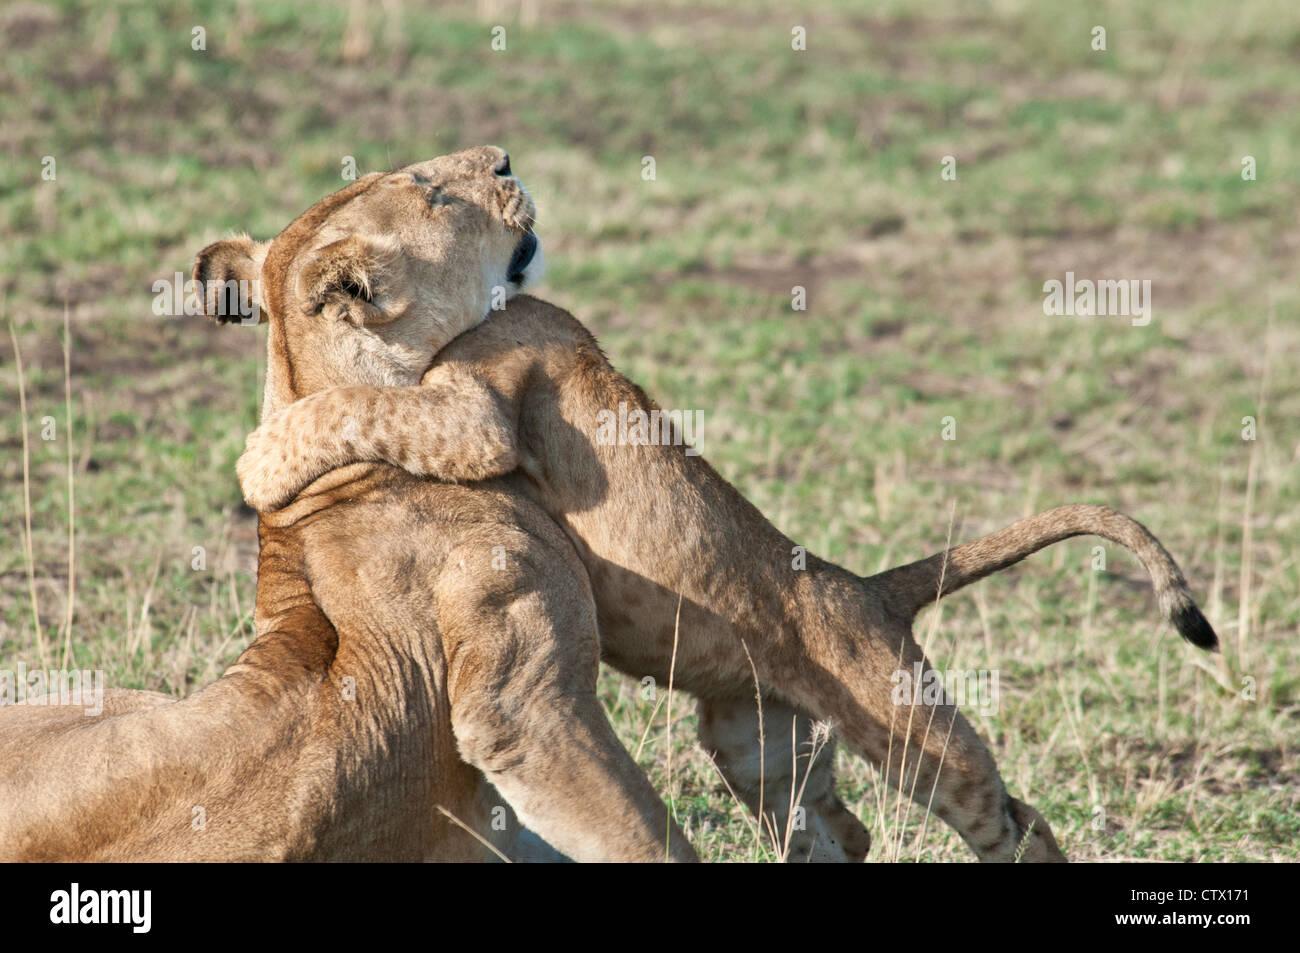 Löwenjunges umarmt Mutter Löwin, Panthera Leo, Masai Mara National Reserve, Kenia, Afrika Stockbild